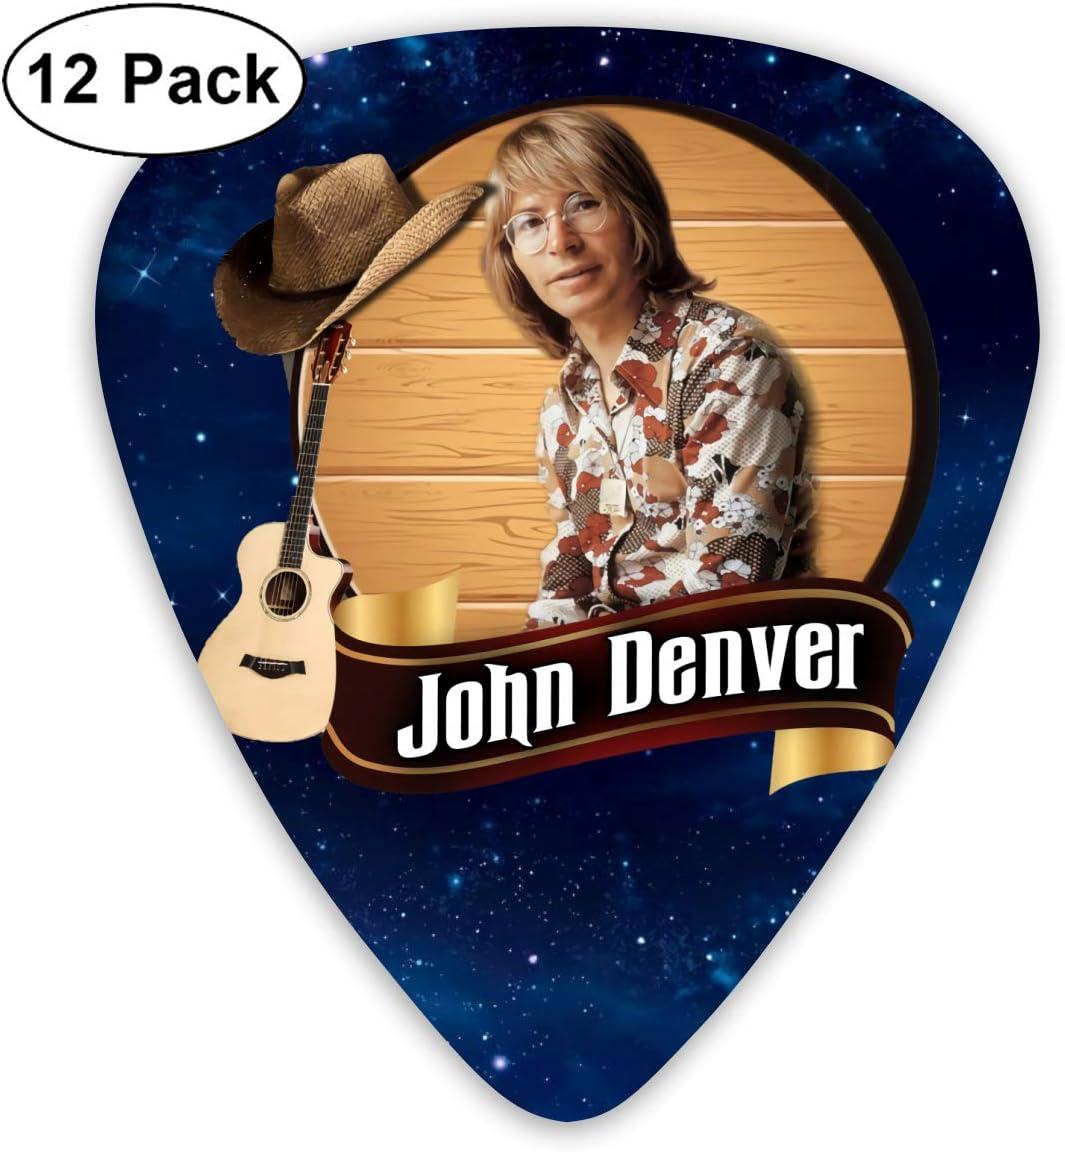 Modern Design Stylish Patterned Guitar Picks John Denver This Selection Of Guitar Picks